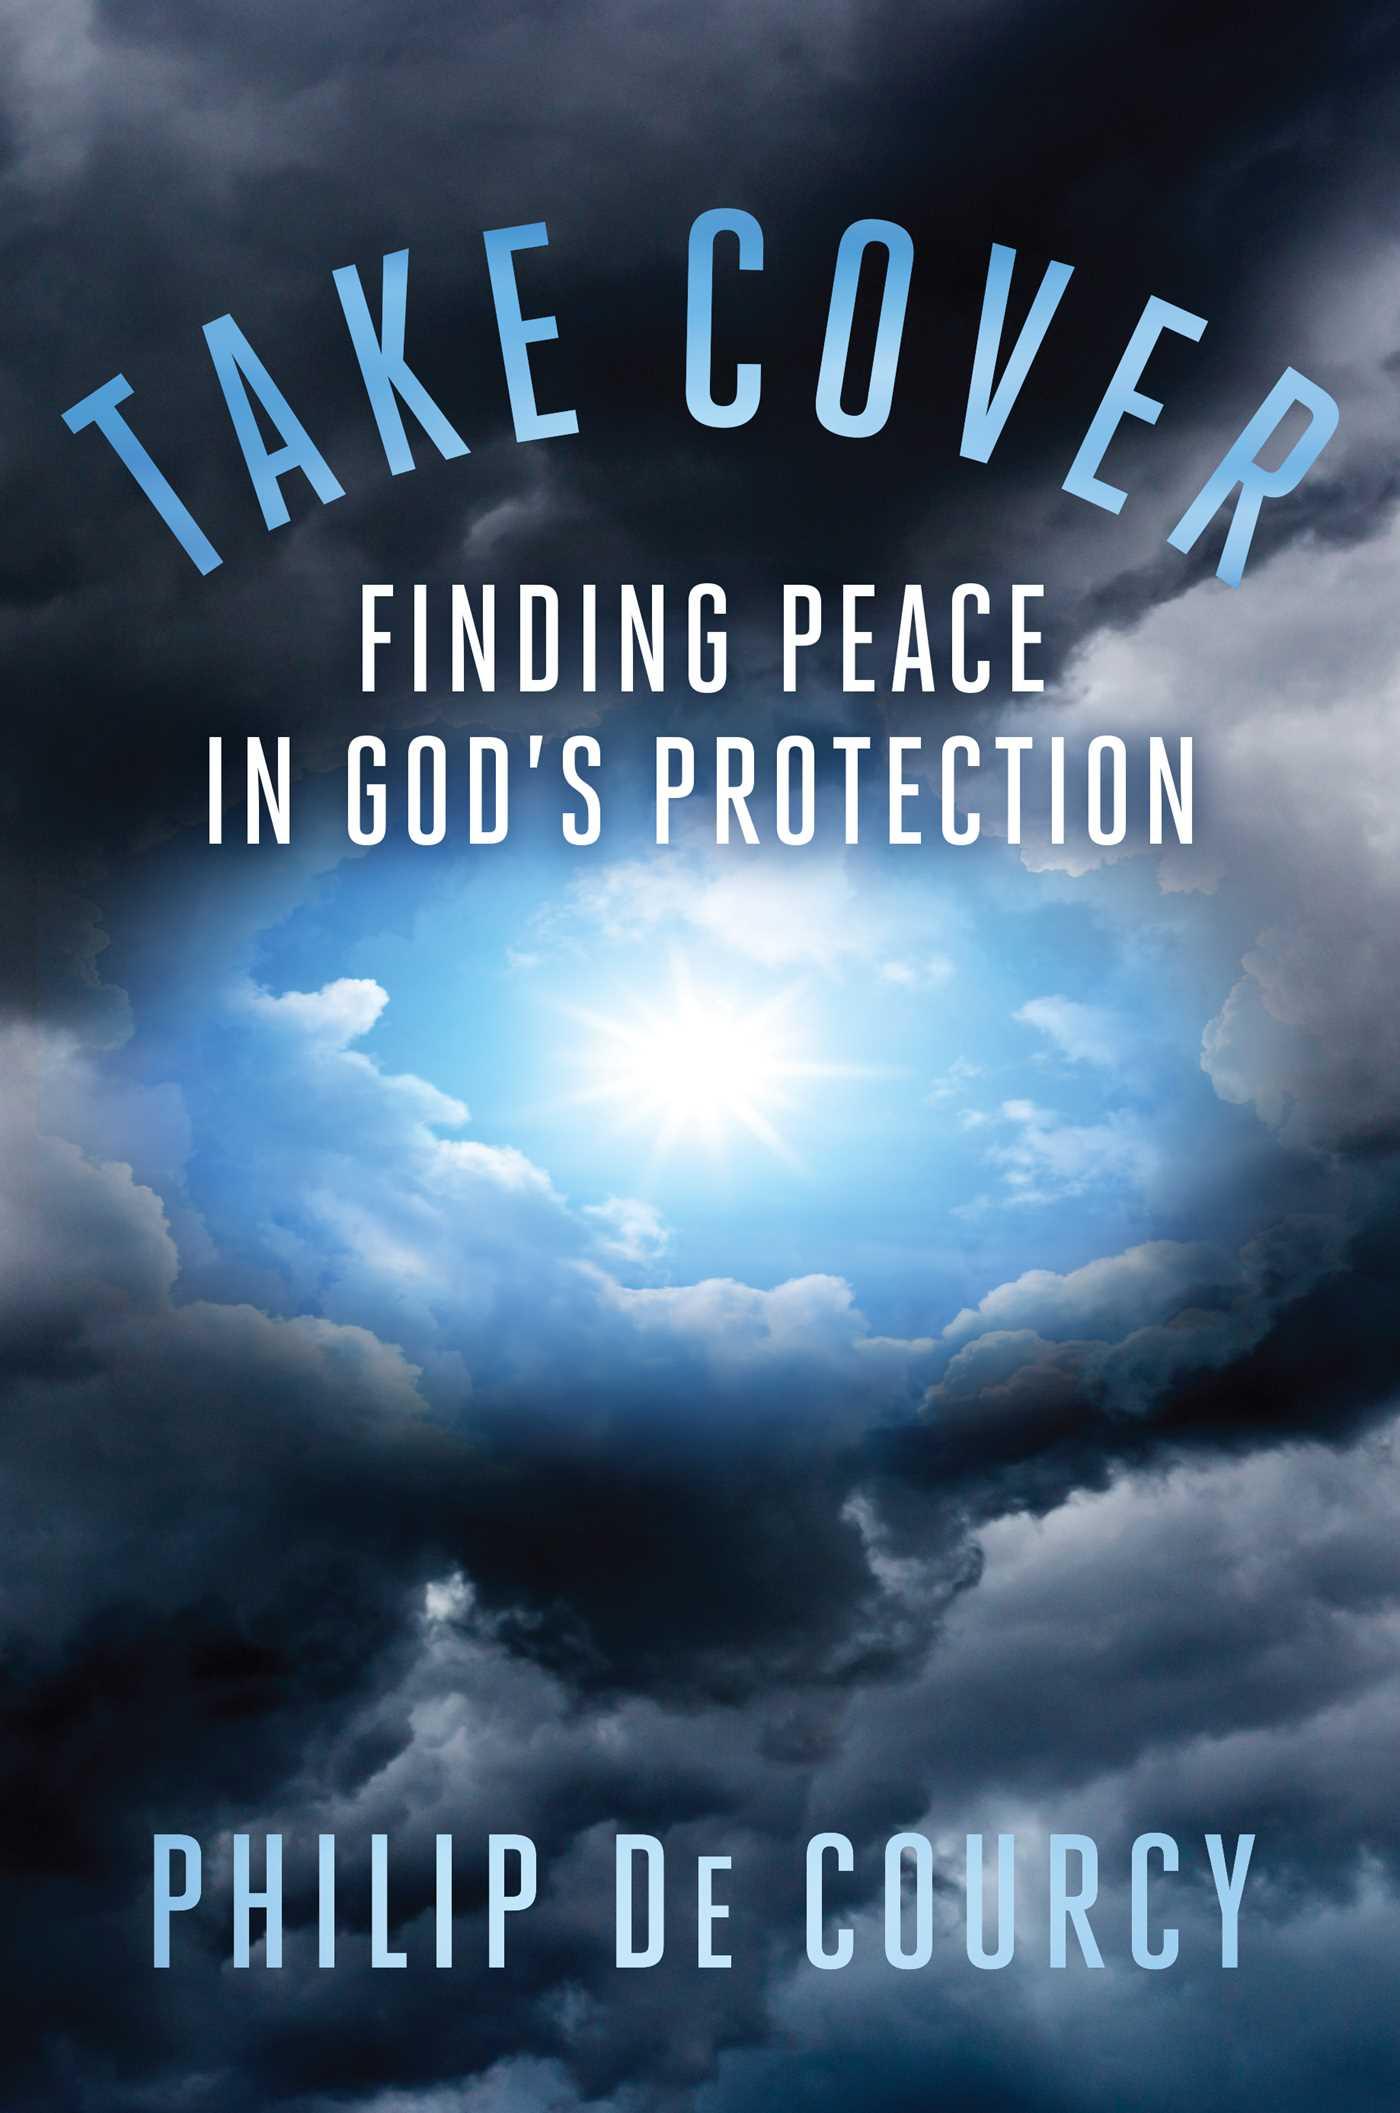 Take cover 9781621578048 hr